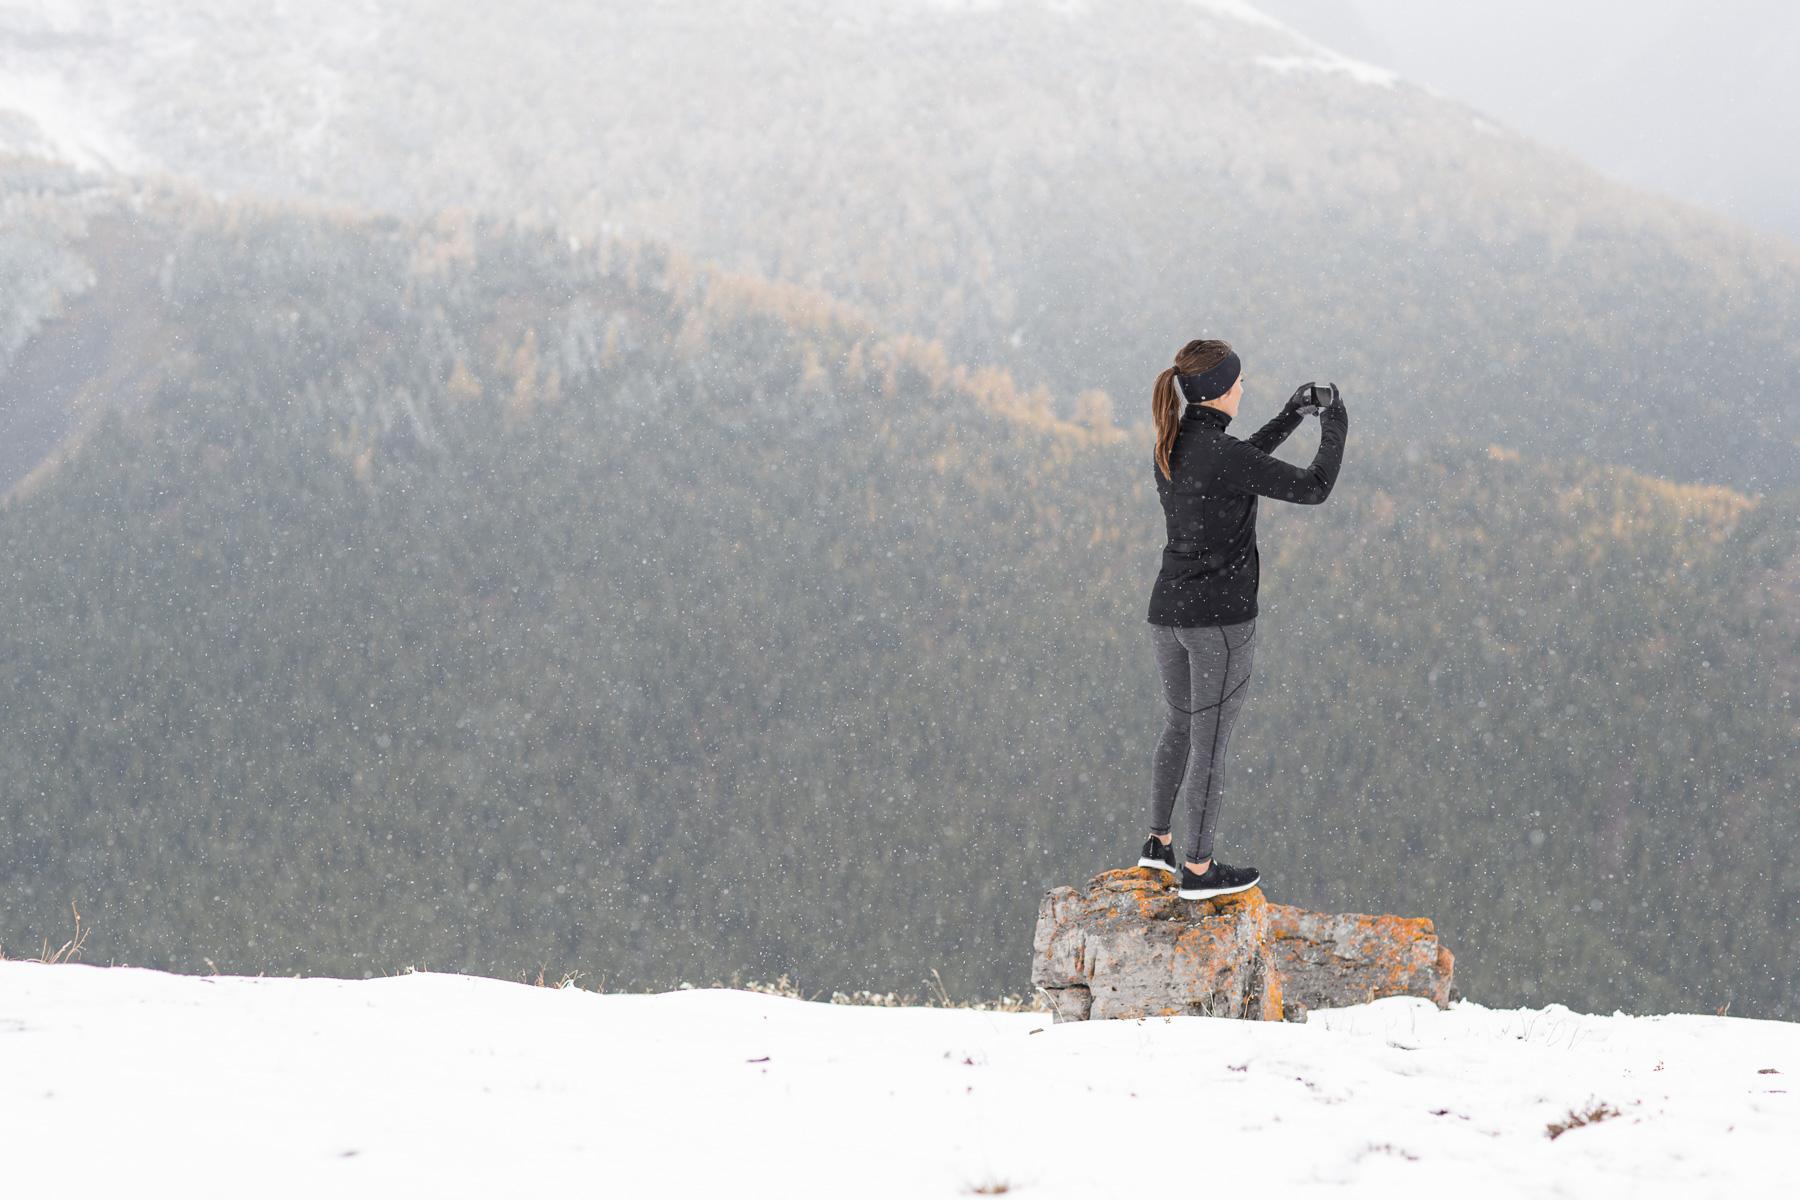 Ashley Barker LuluLemon Banff Mountain Overlooking Photographer Snowing Grey Flash Photography